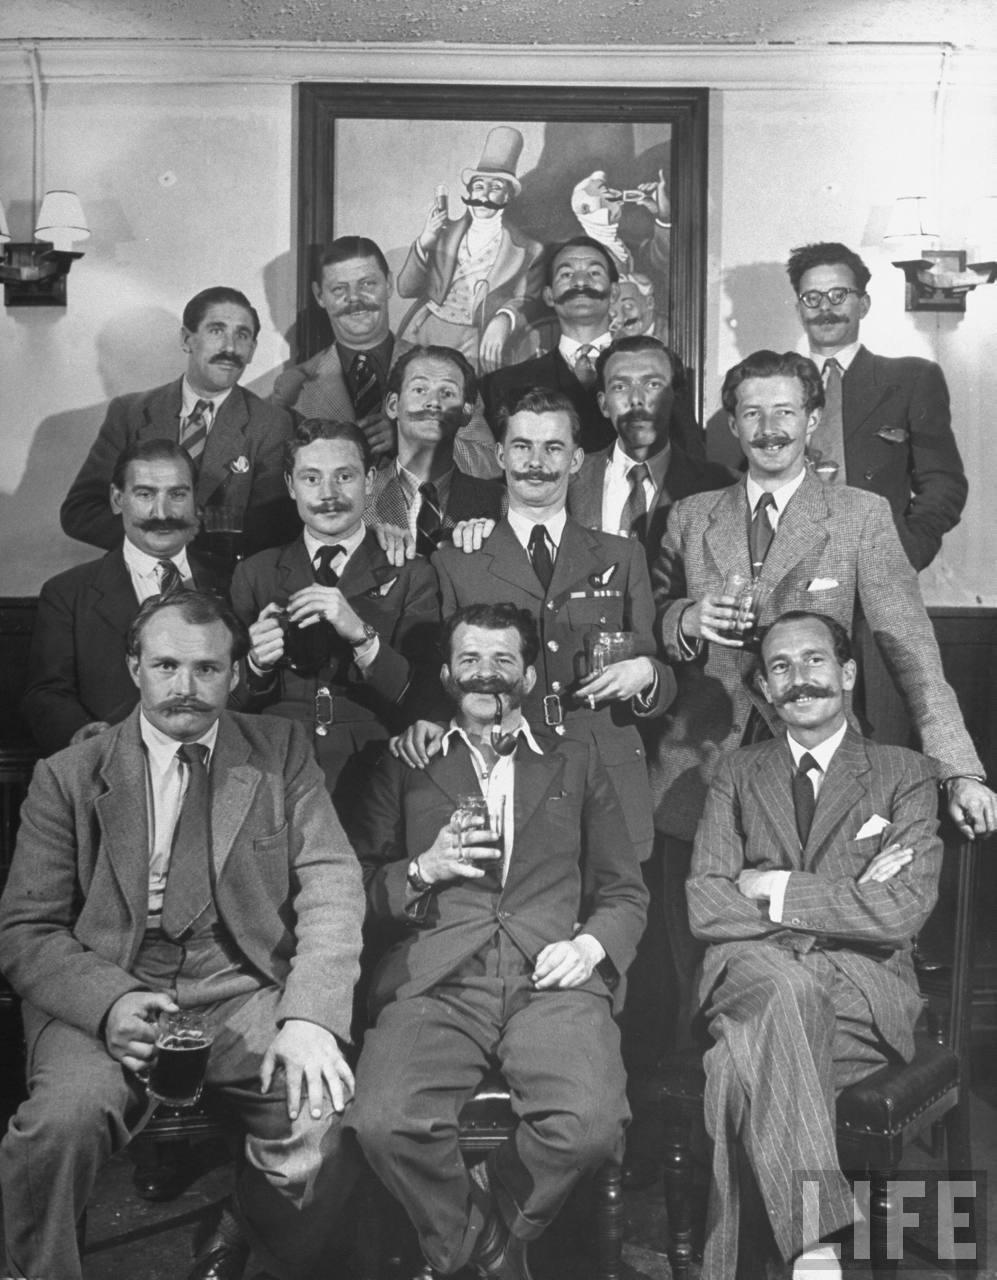 The Handlebar Club enjoys a drink. 1947.